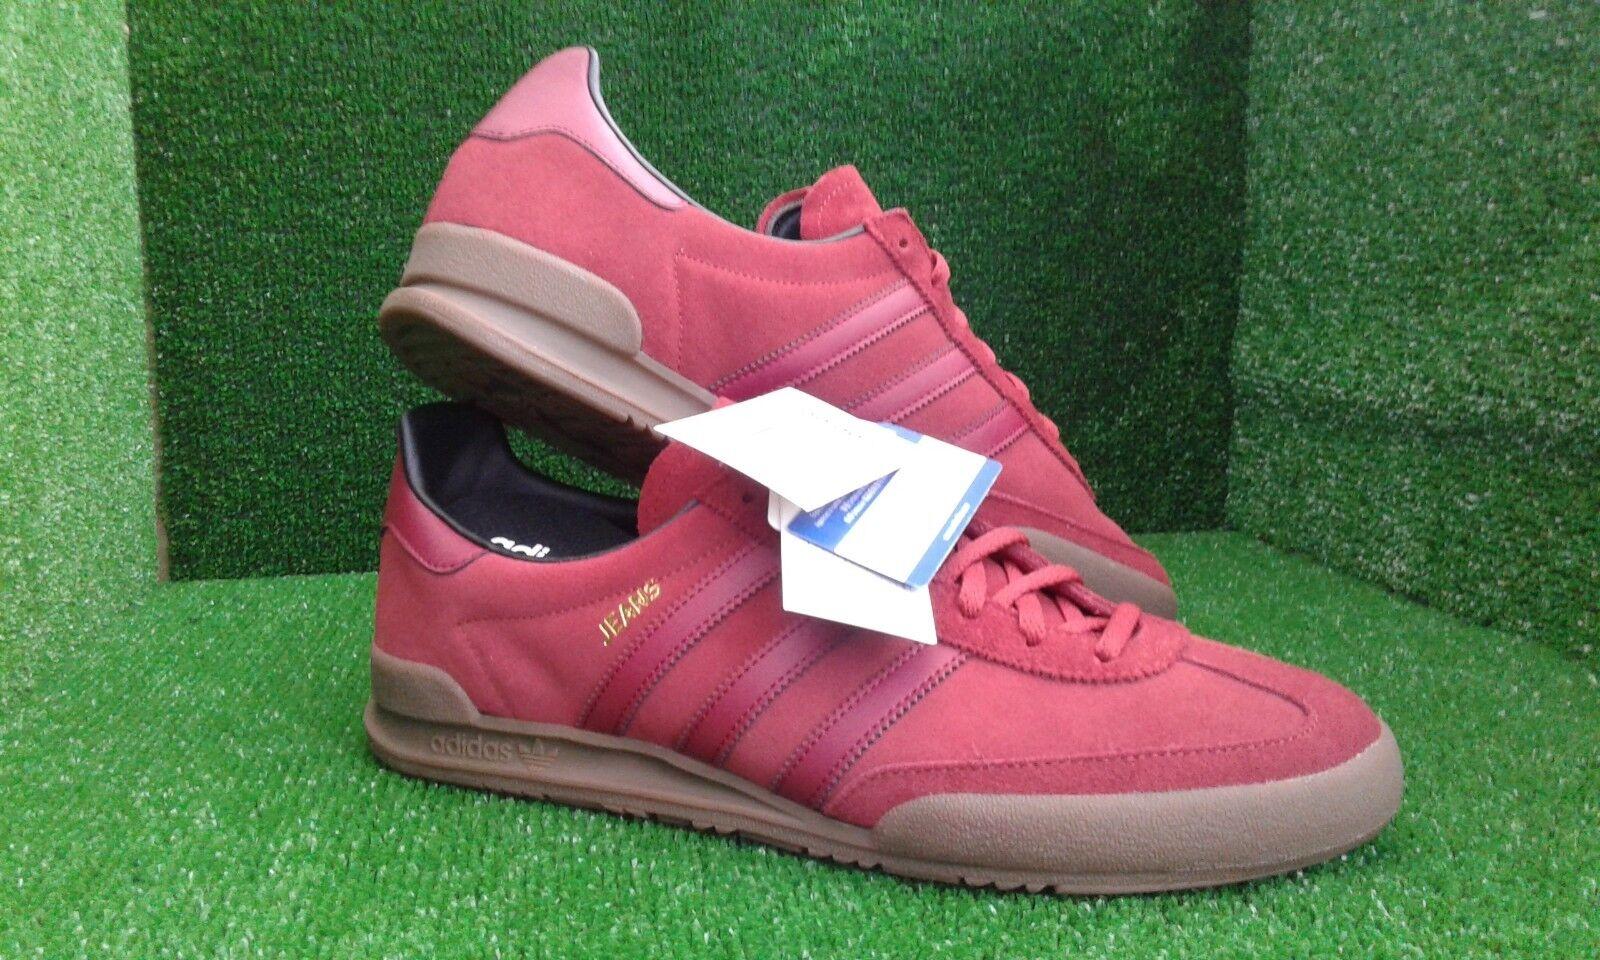 Adidas Jeans mk2 mystery rot suede Uk 11.5 visit London paris Amsterdam gtx bern